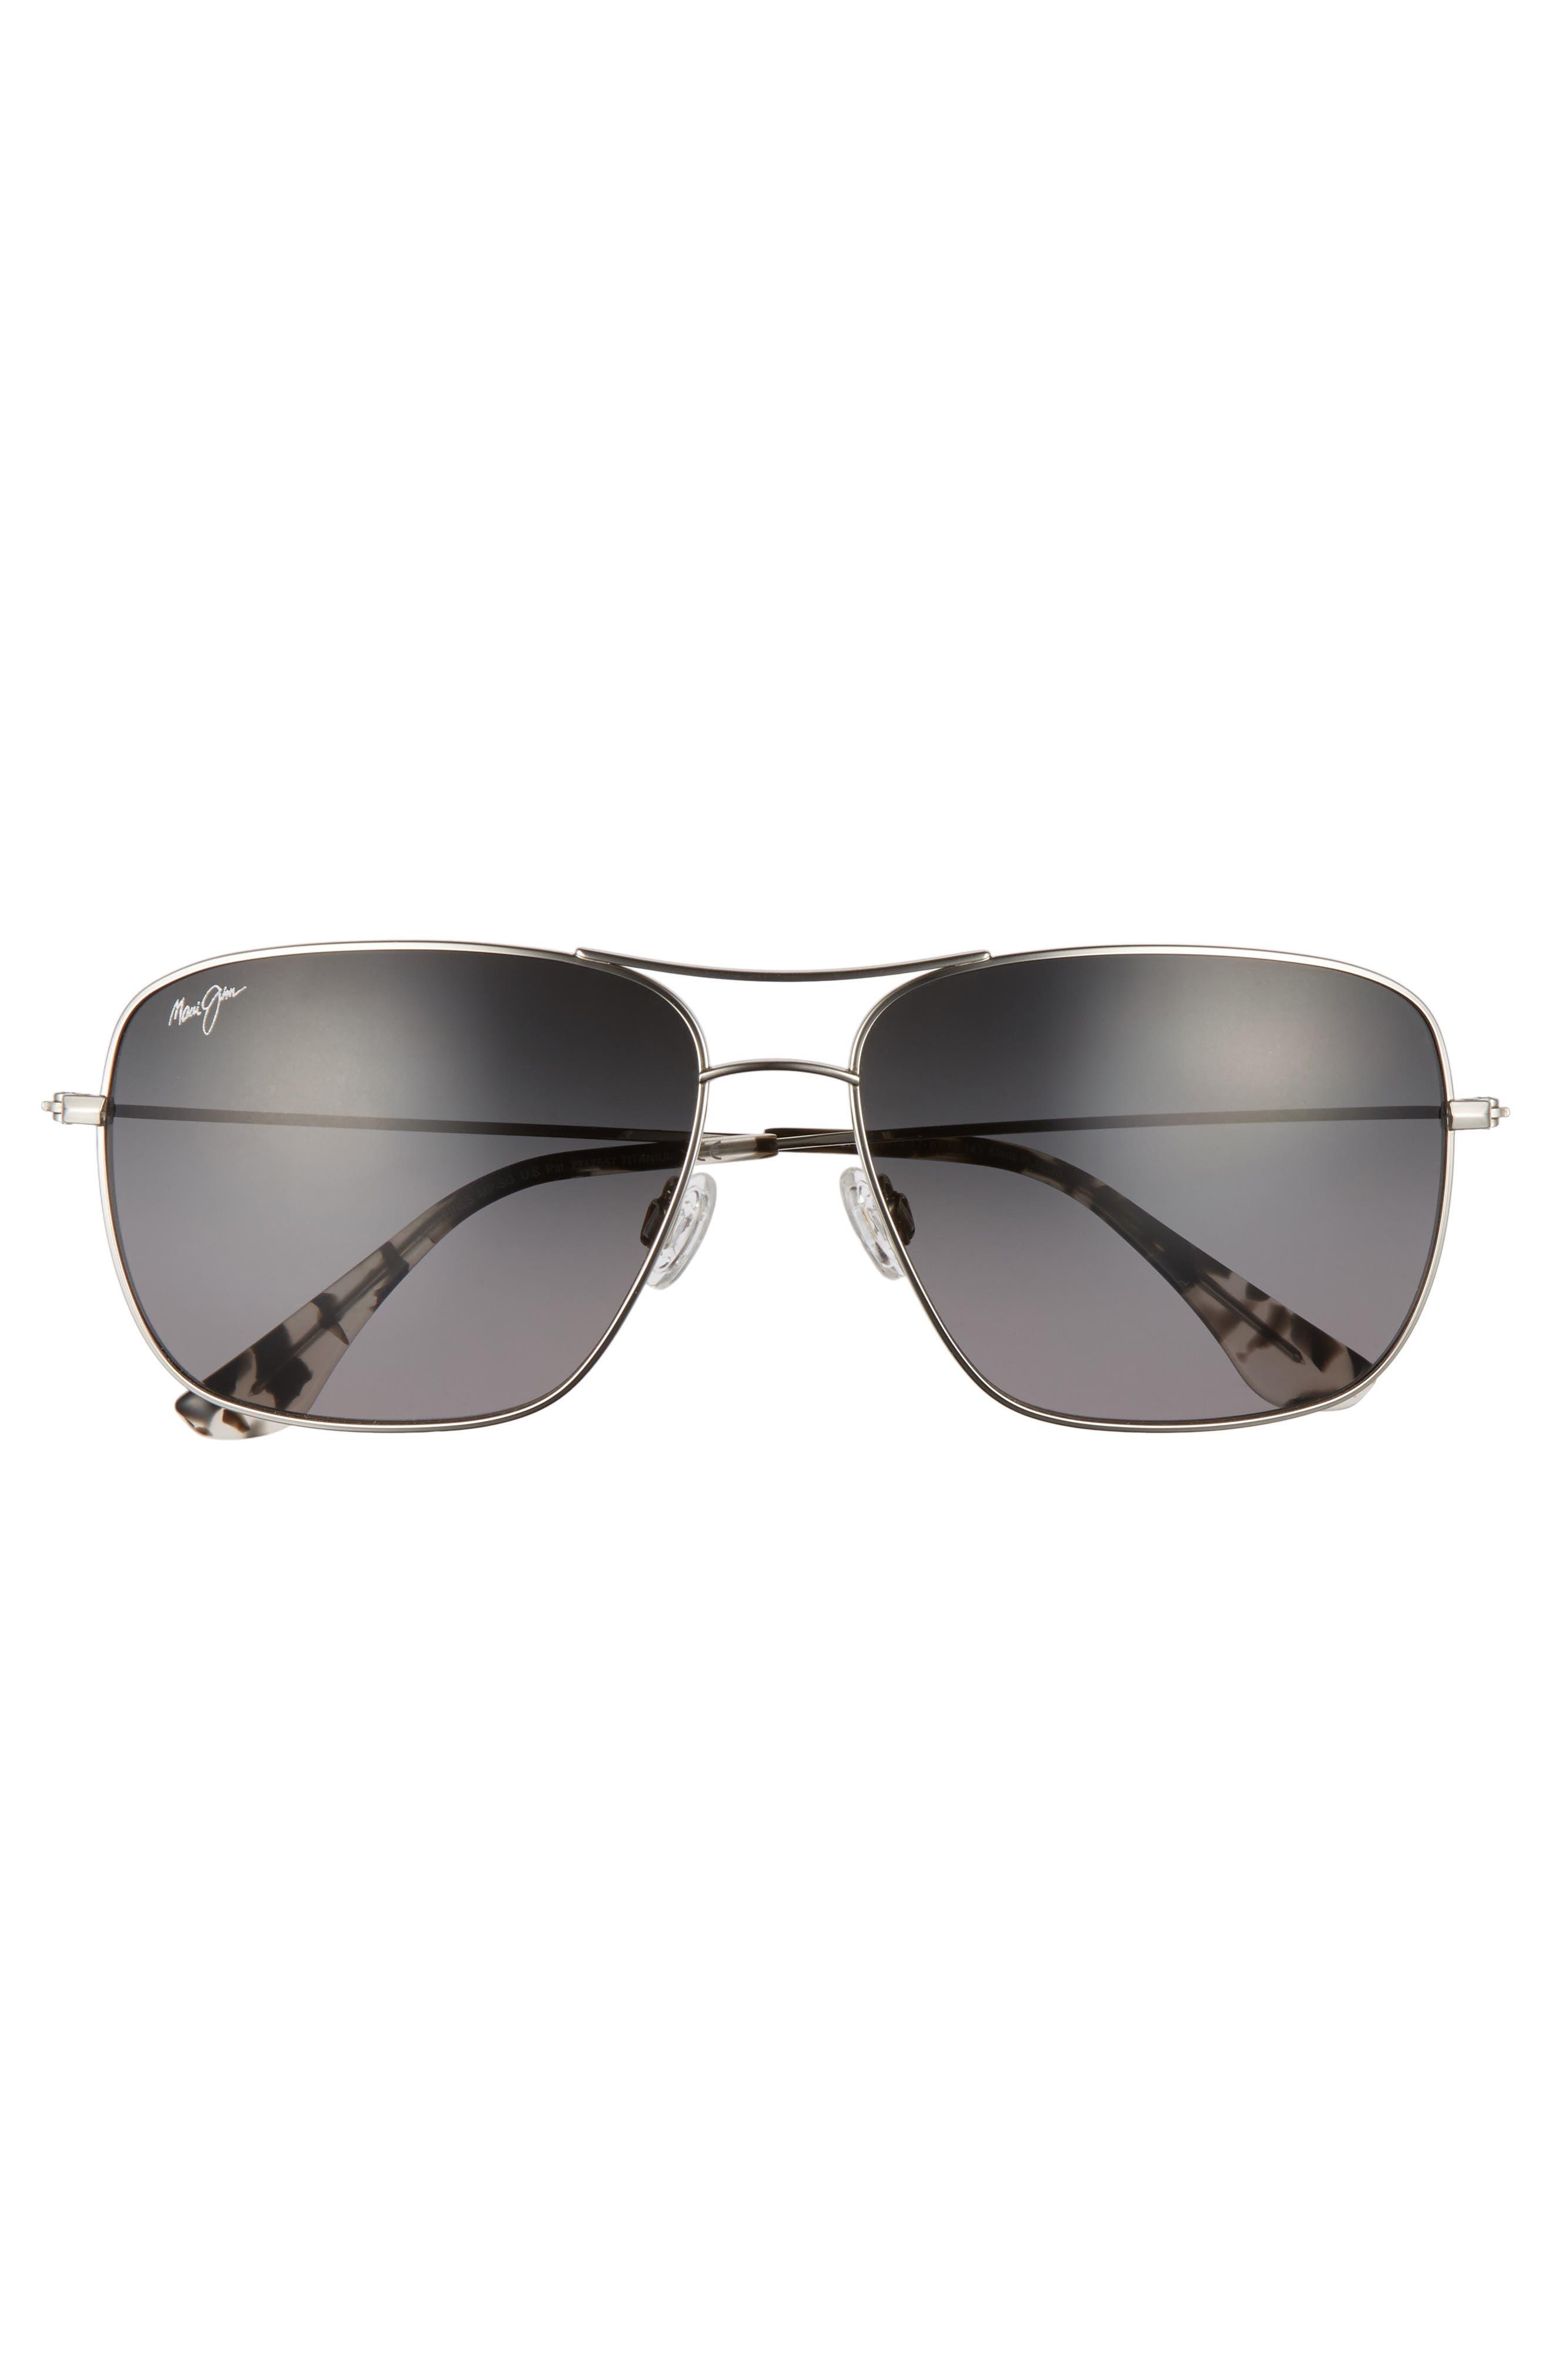 Cook Pines 63mm Polarized Titanium Aviator Sunglasses,                             Alternate thumbnail 10, color,